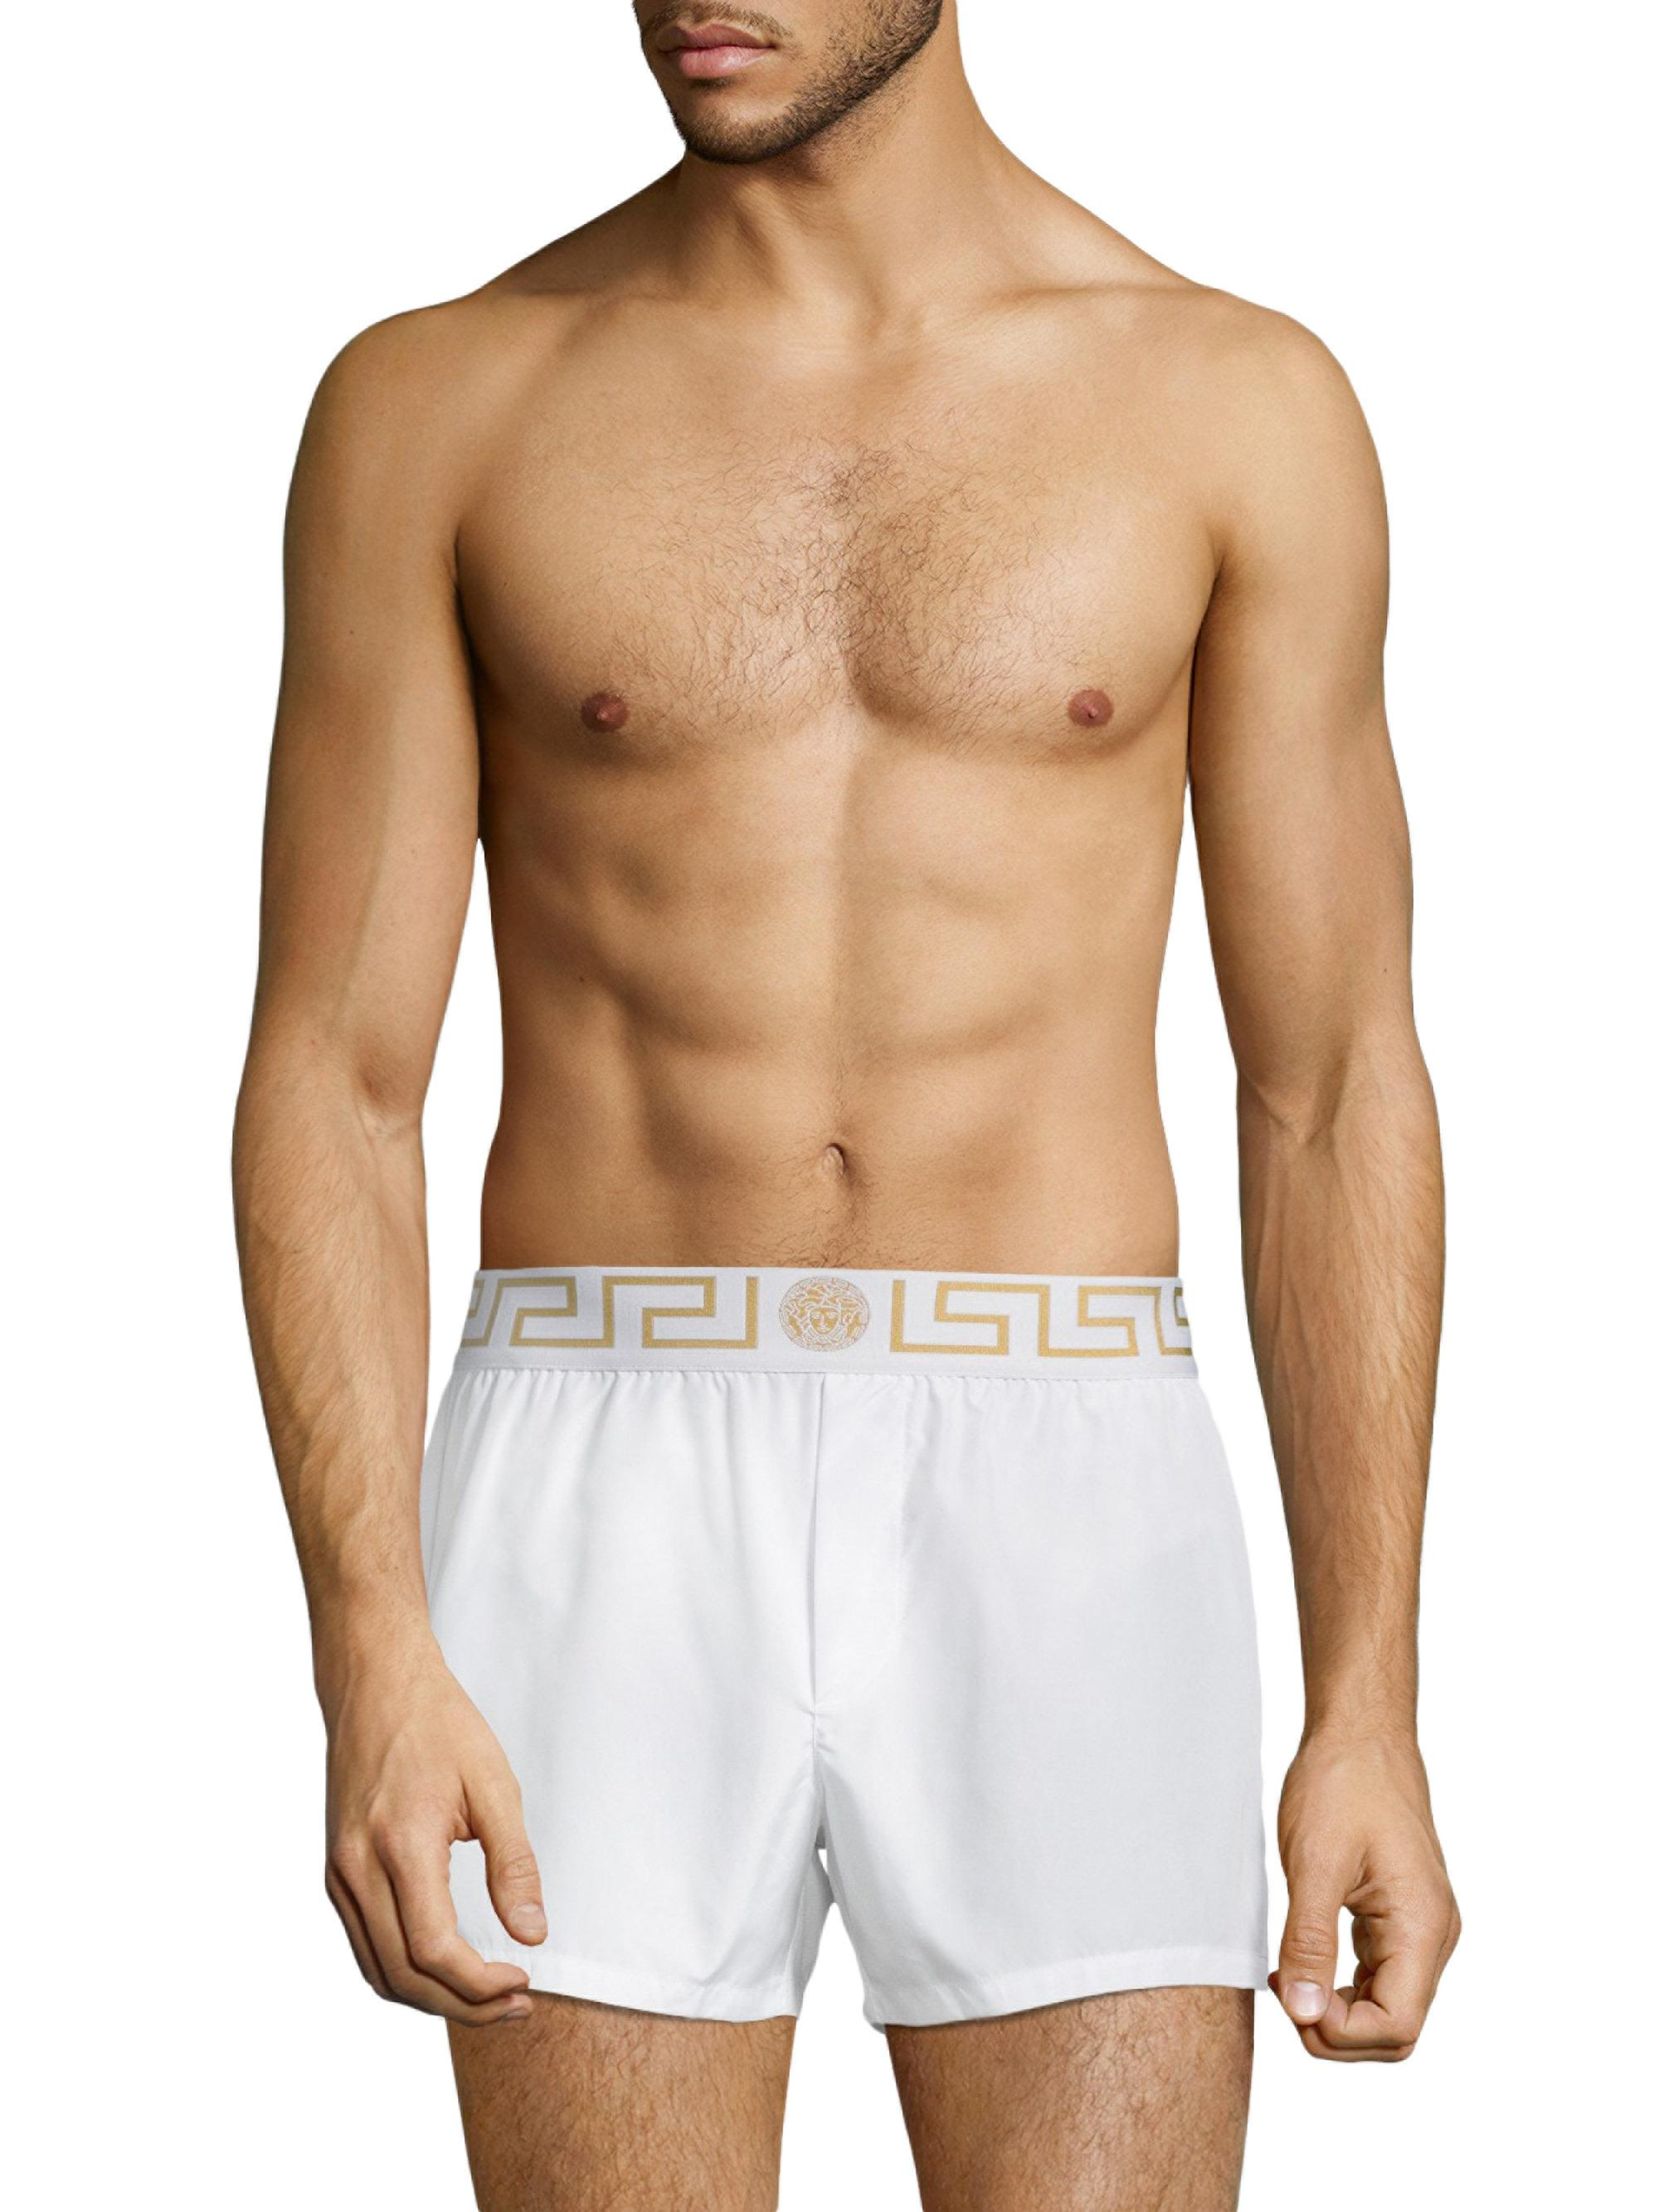 Lyst - Versace Swim Shorts in White for Men 948913799